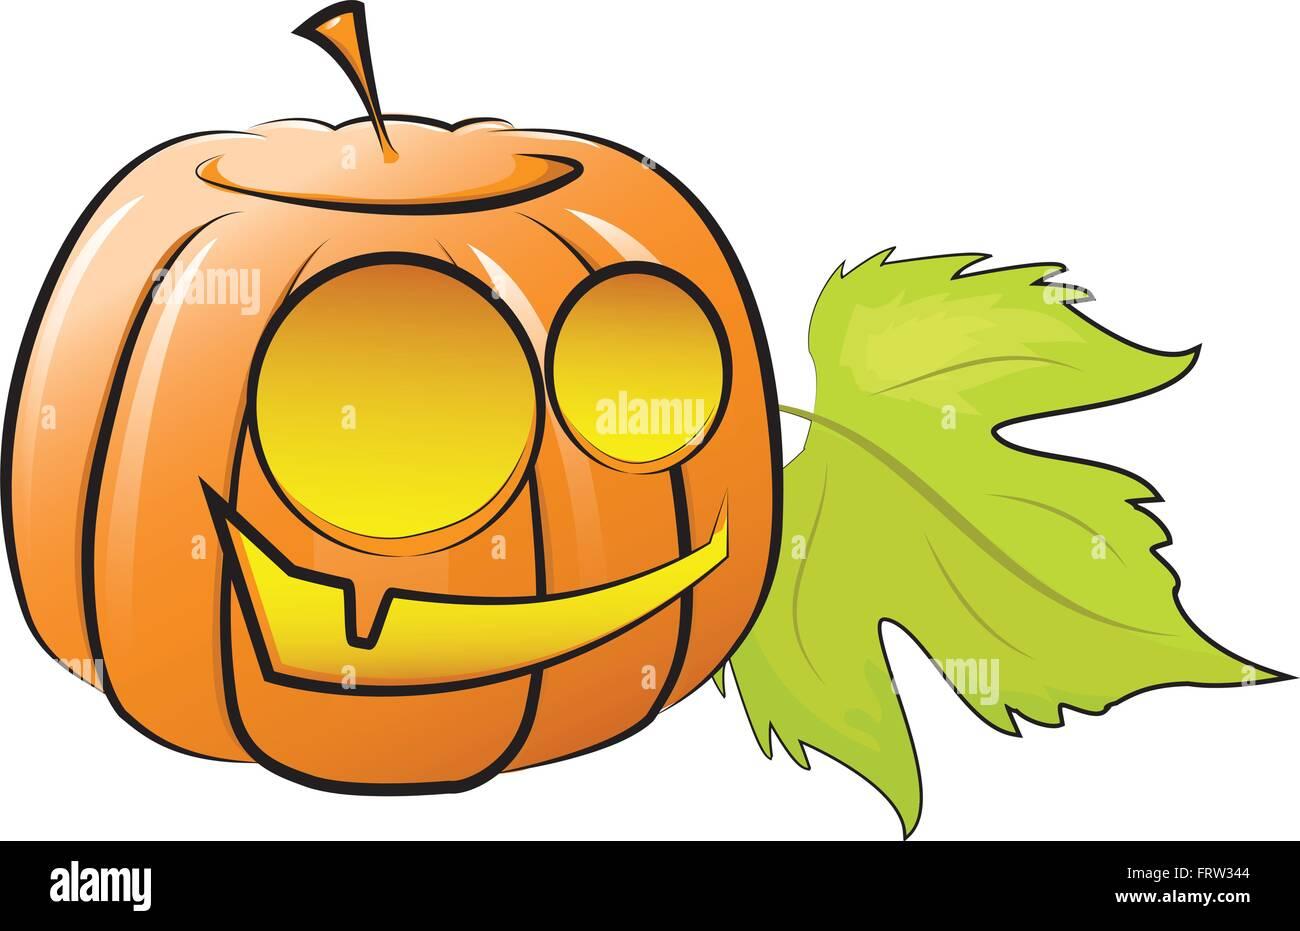 Vector illustration. fun pumpkin decorating for Halloween - Stock Vector